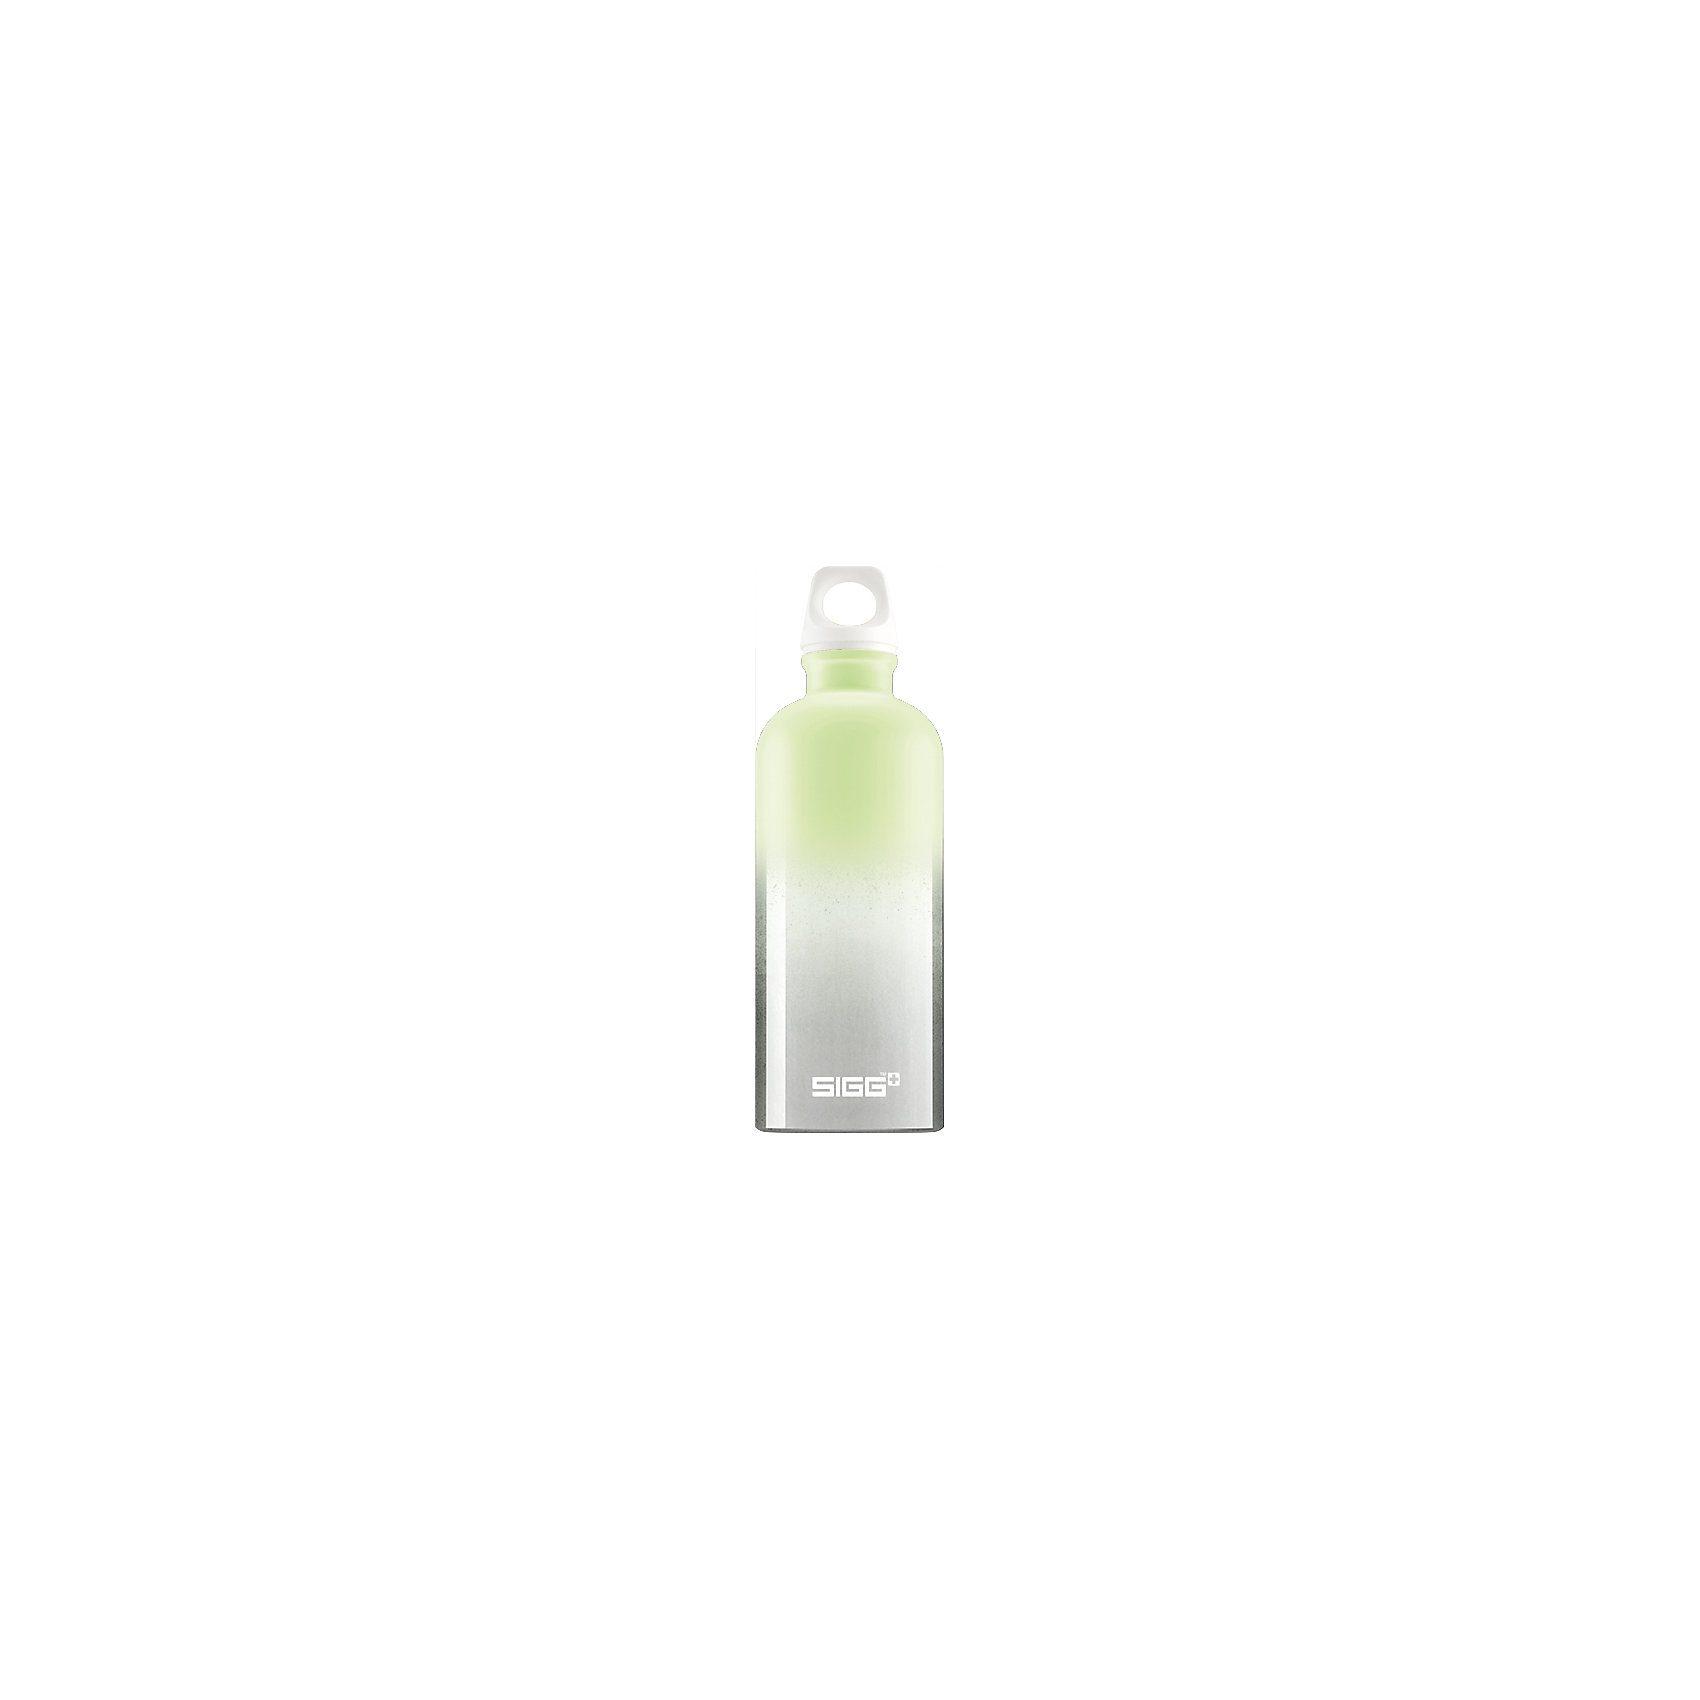 SIGG Alu-Trinkflasche CRAZY Pastel Green, 600 ml